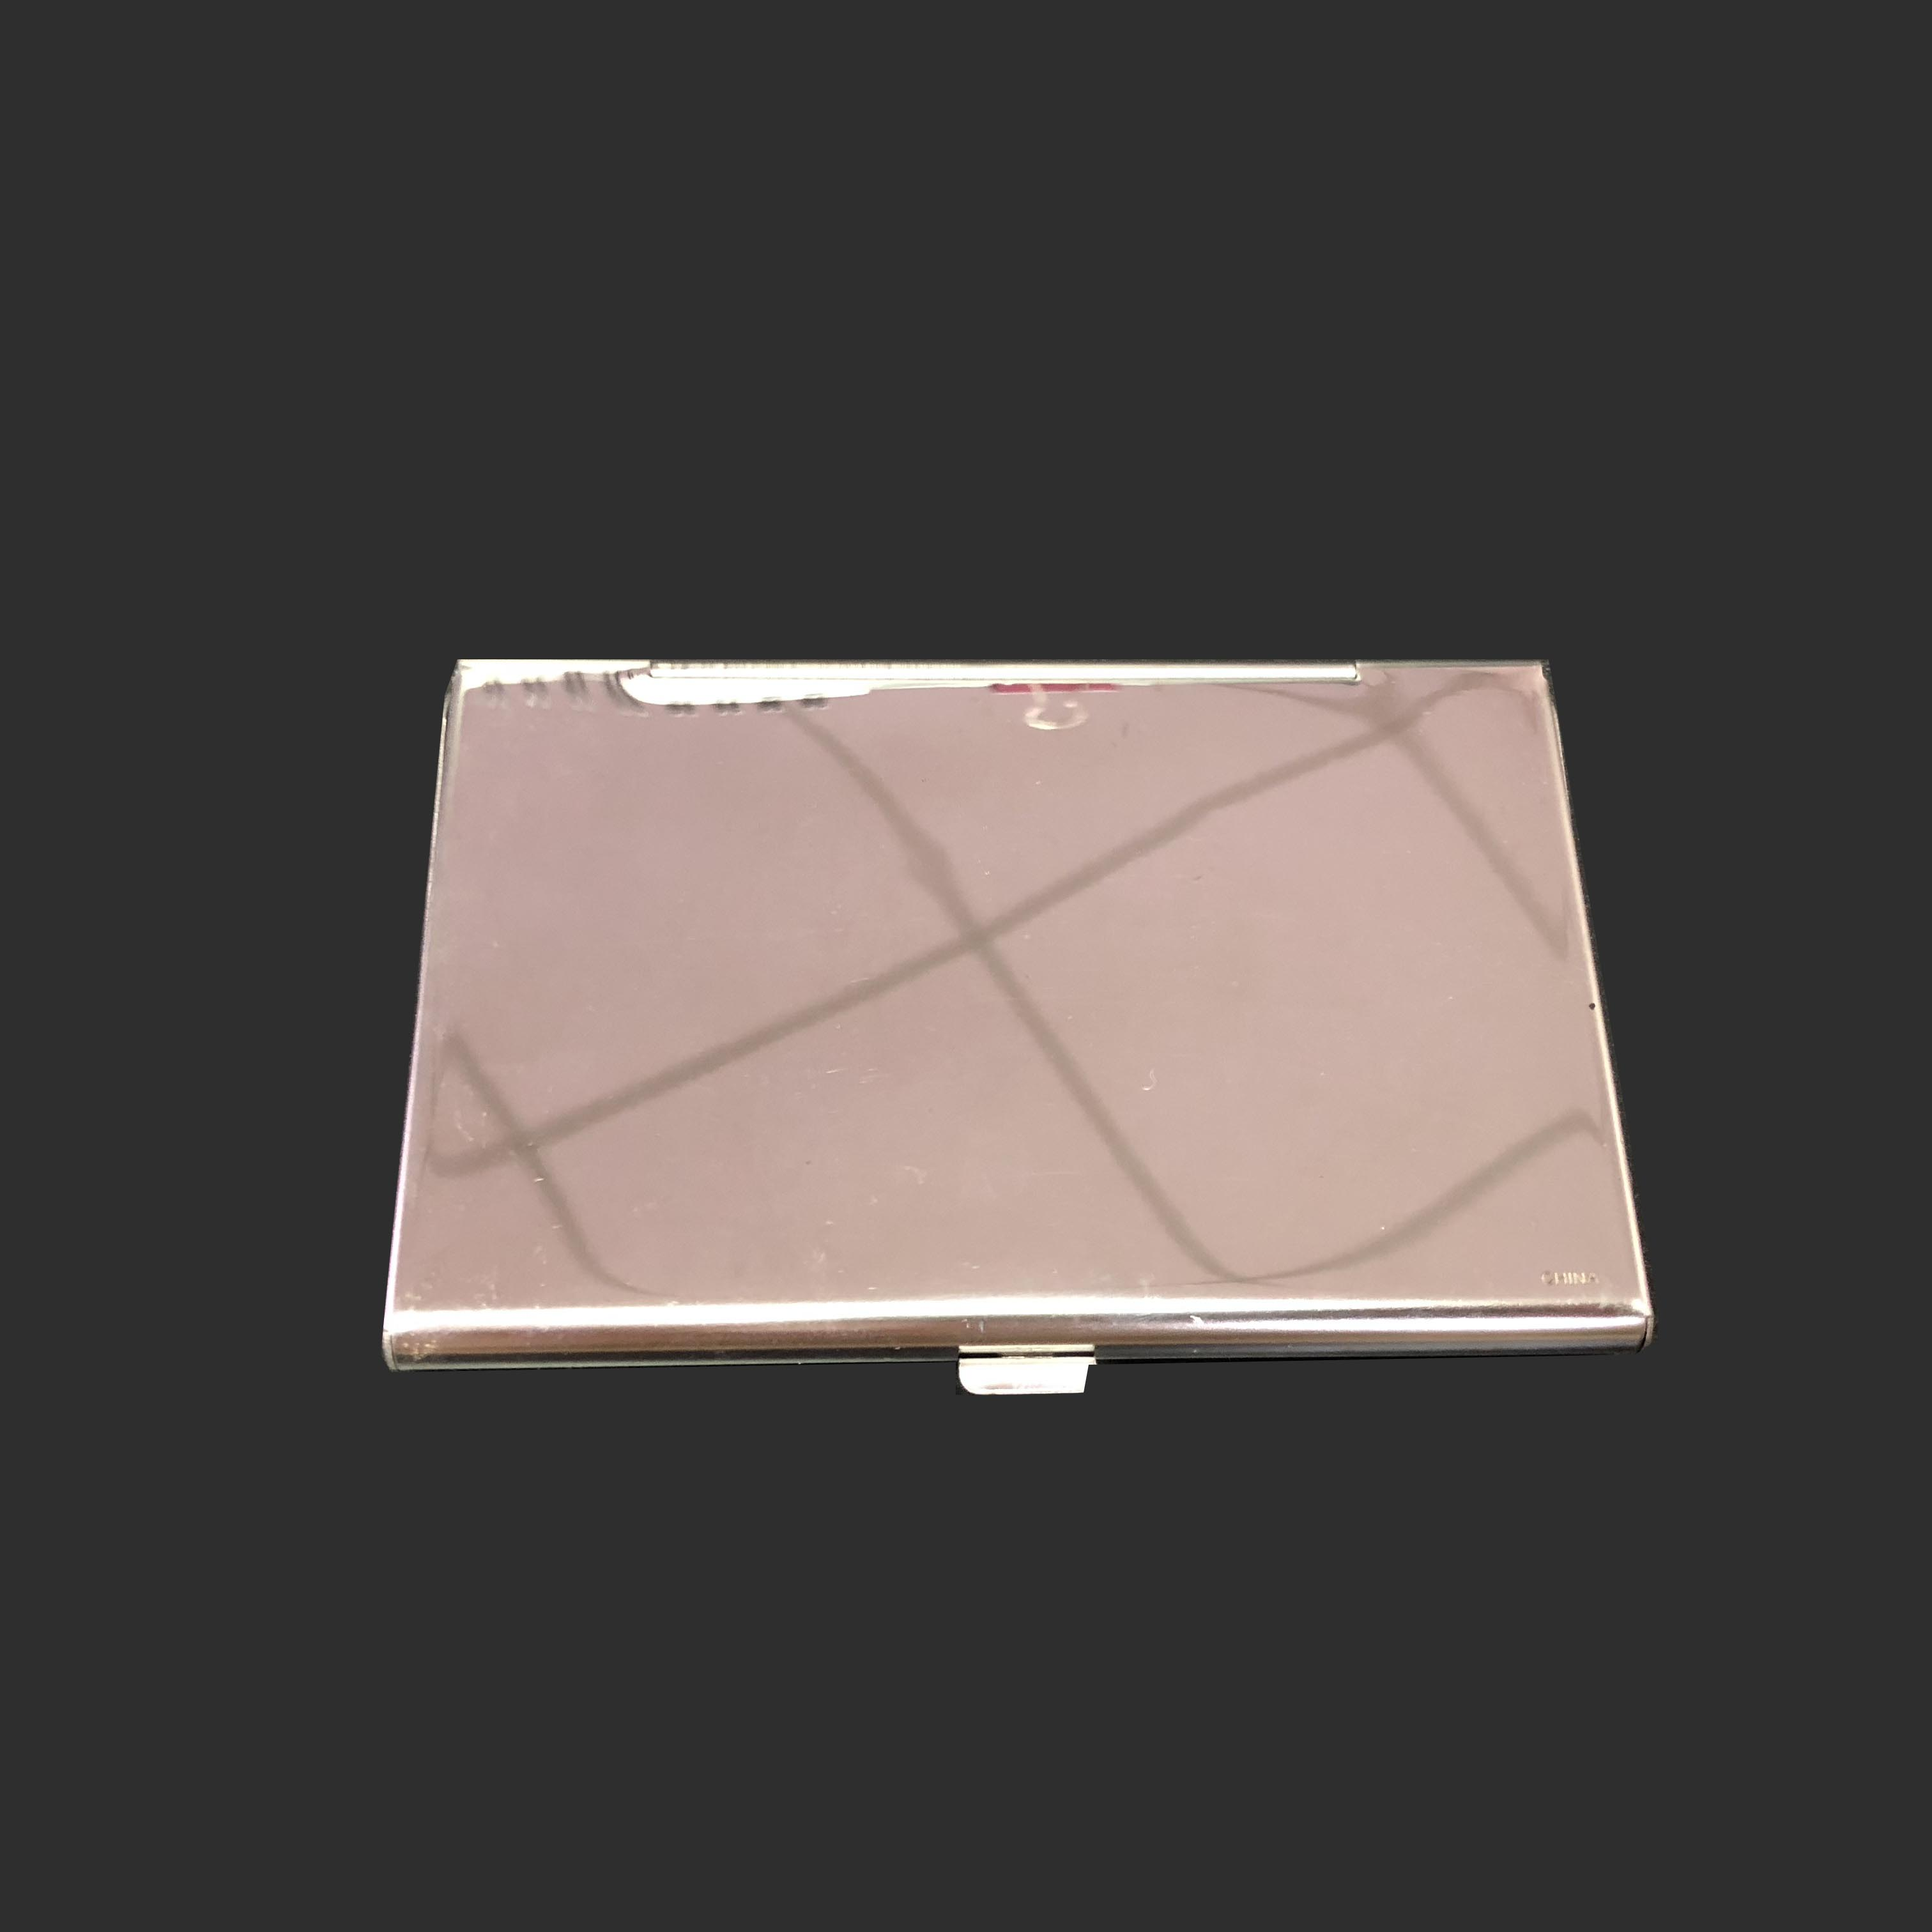 Ipromo Array image426